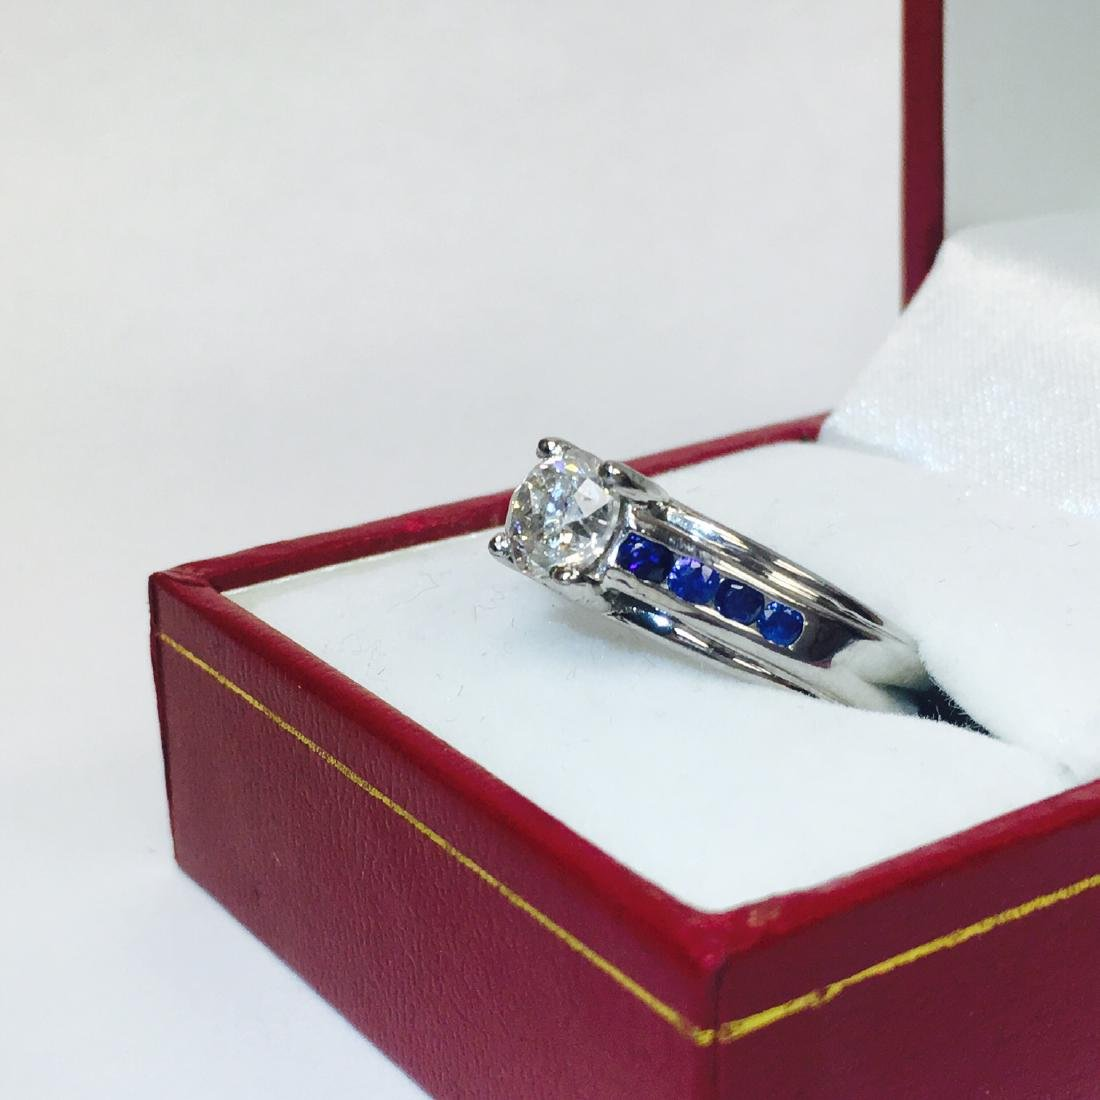 18K, 1.70 Carat Diamond and Blue Sapphire Ring - 3